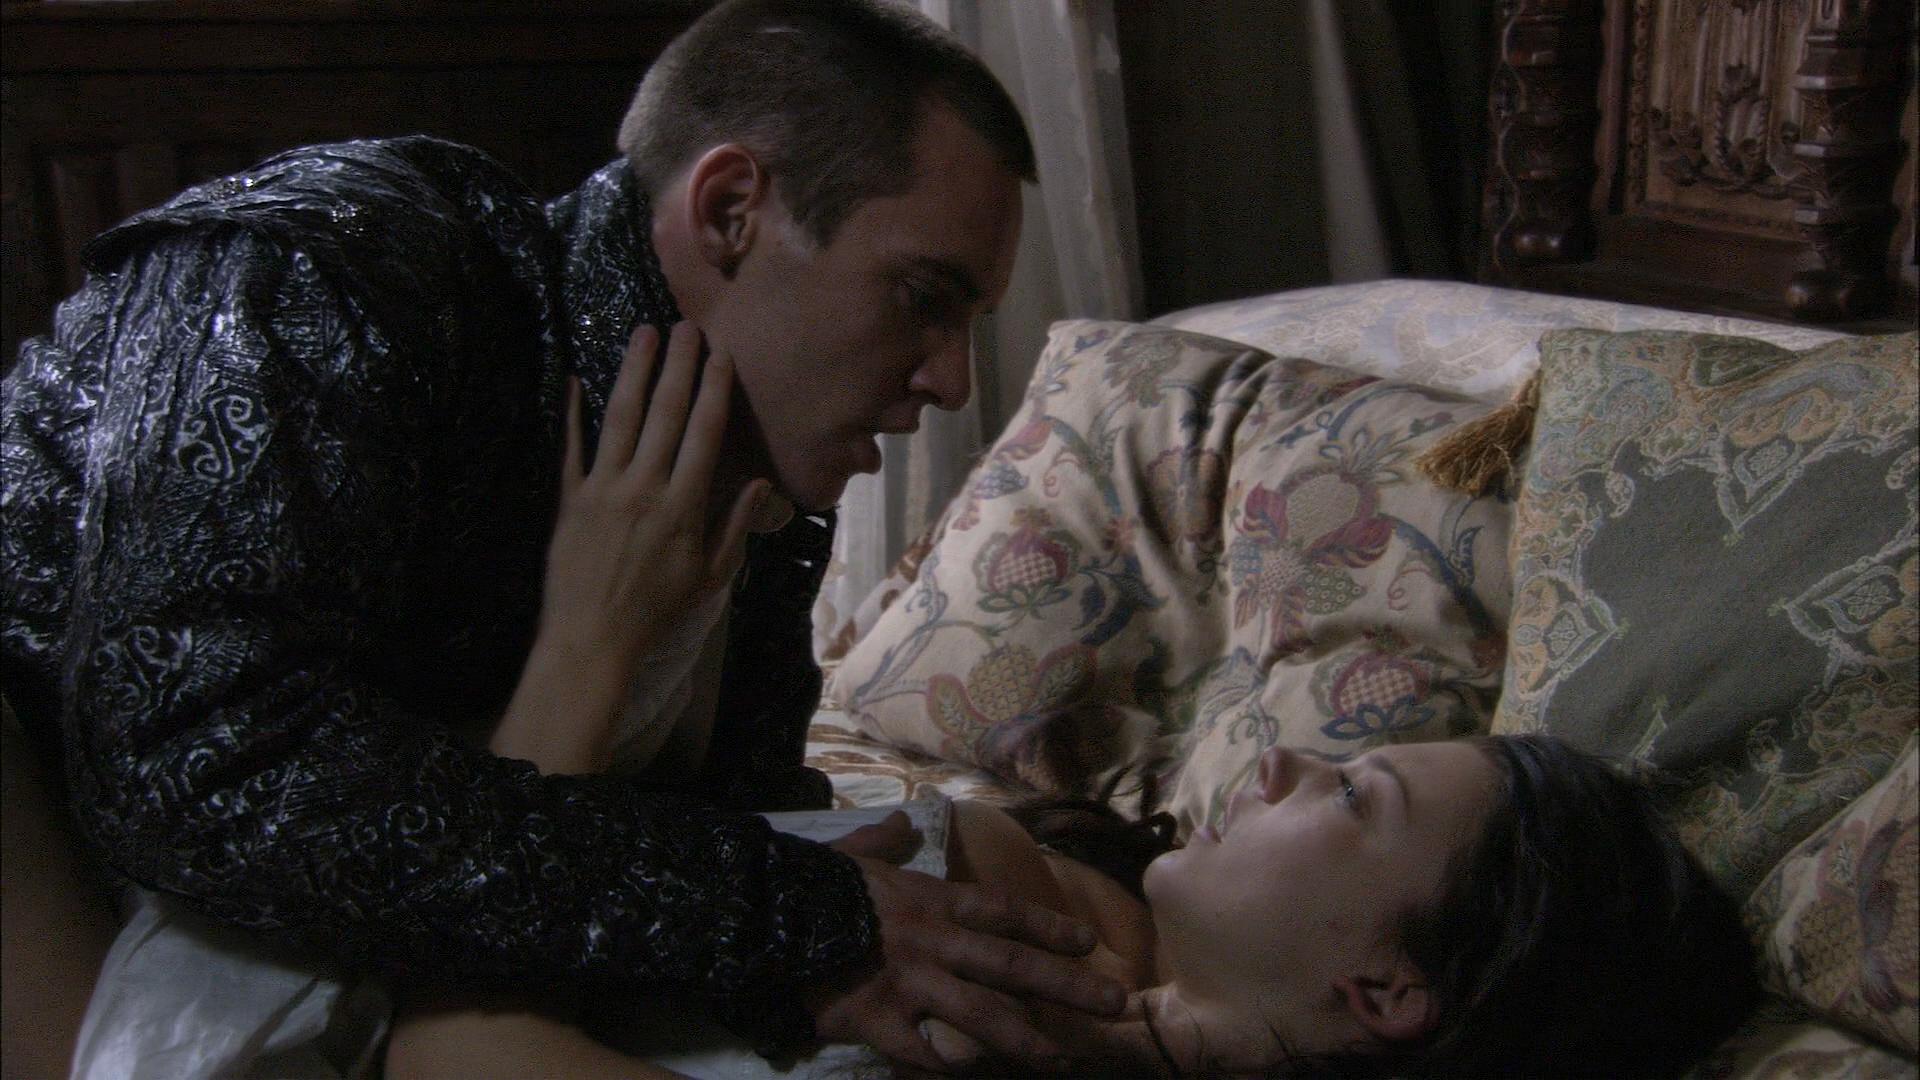 Natalie Dormer hot sex and Gabrielle Anwar hot - The Tudors (2007) S01E05 HD 1080p (4)